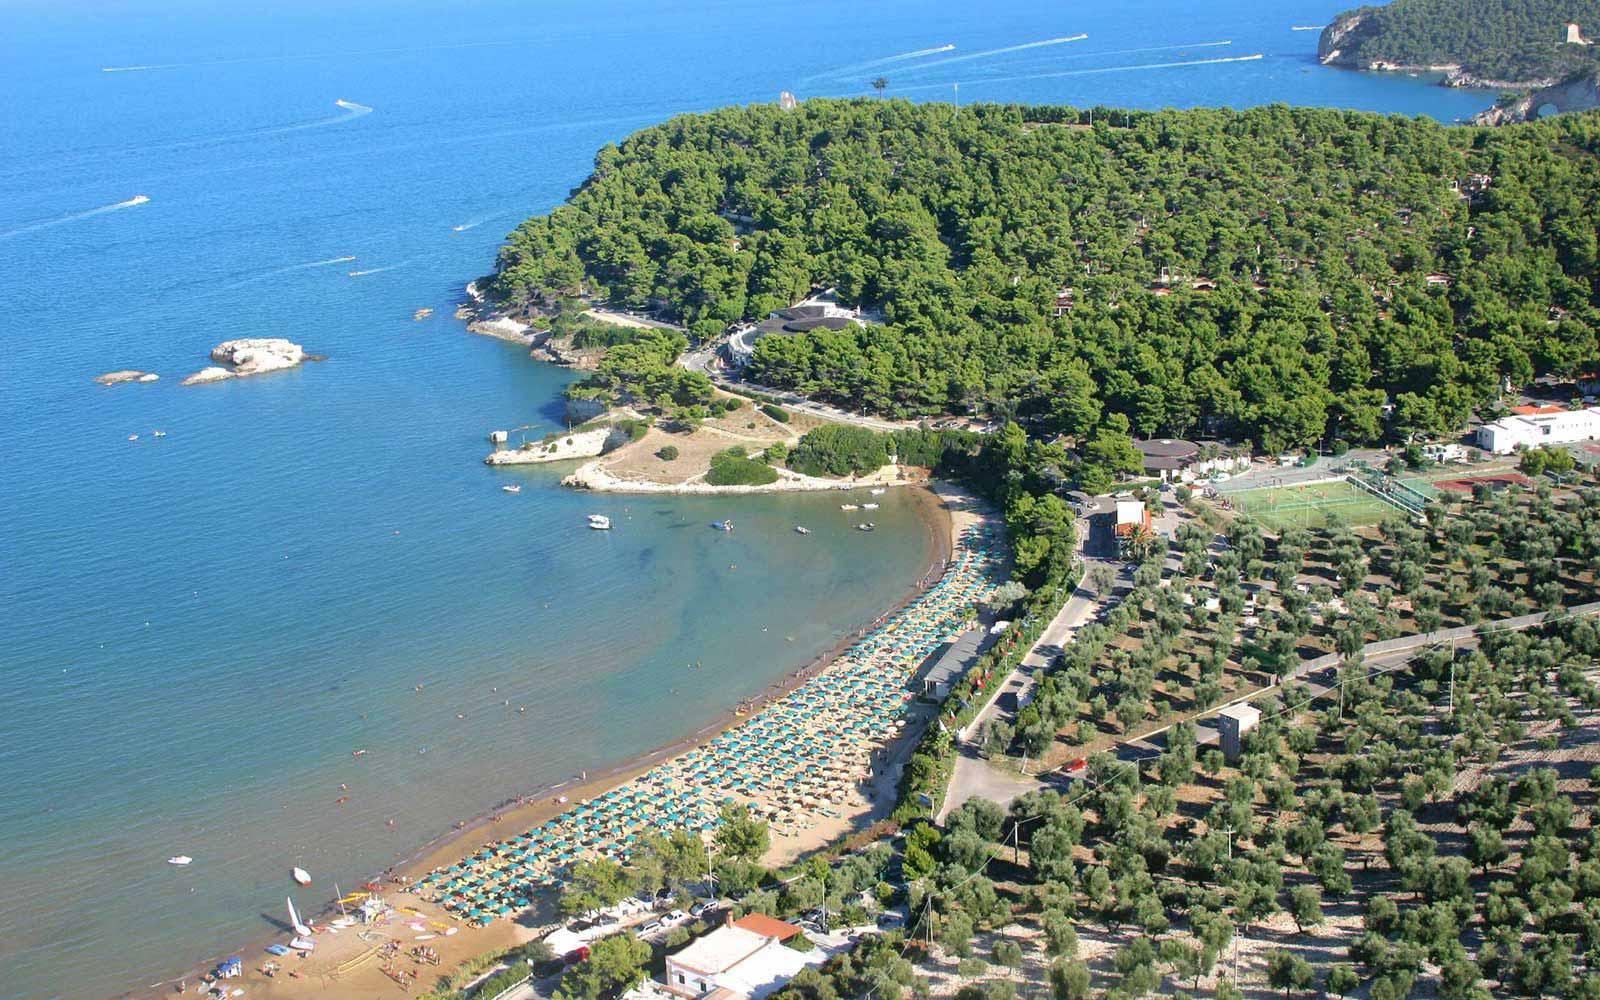 Aereal view of Gattarella Resort